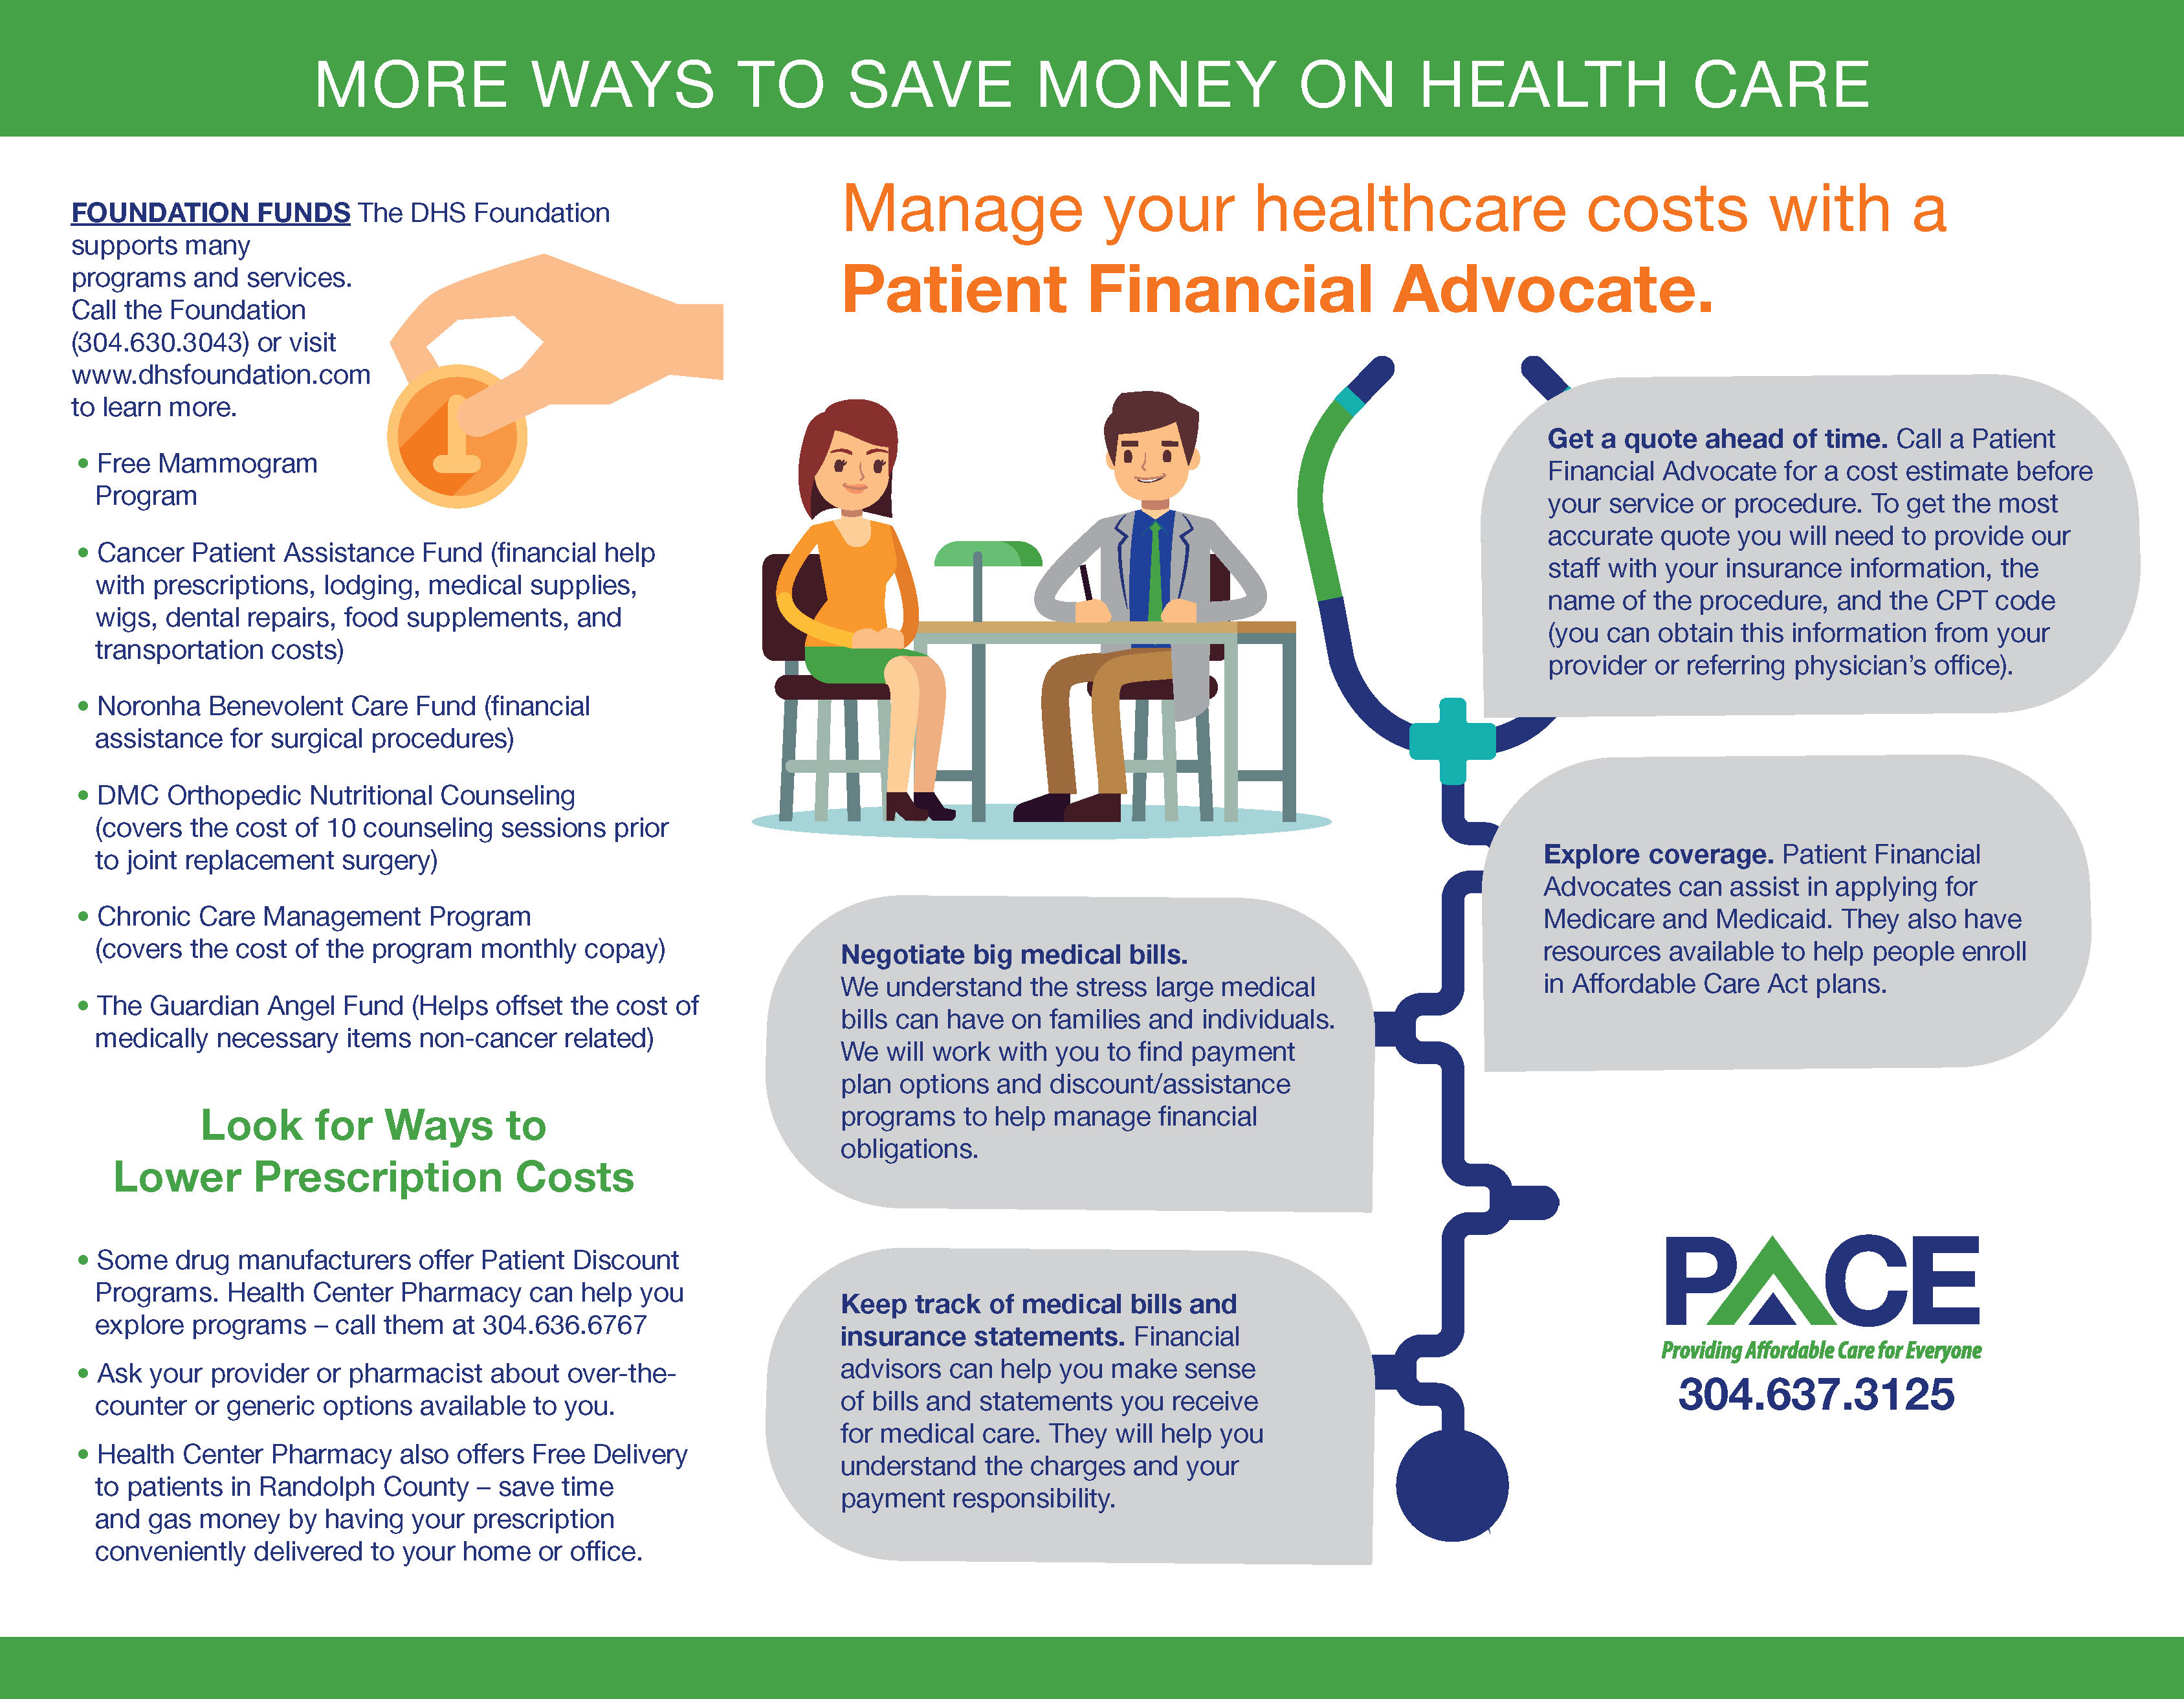 Providing Affordable Care for Everyone (PACE) | Davis ...